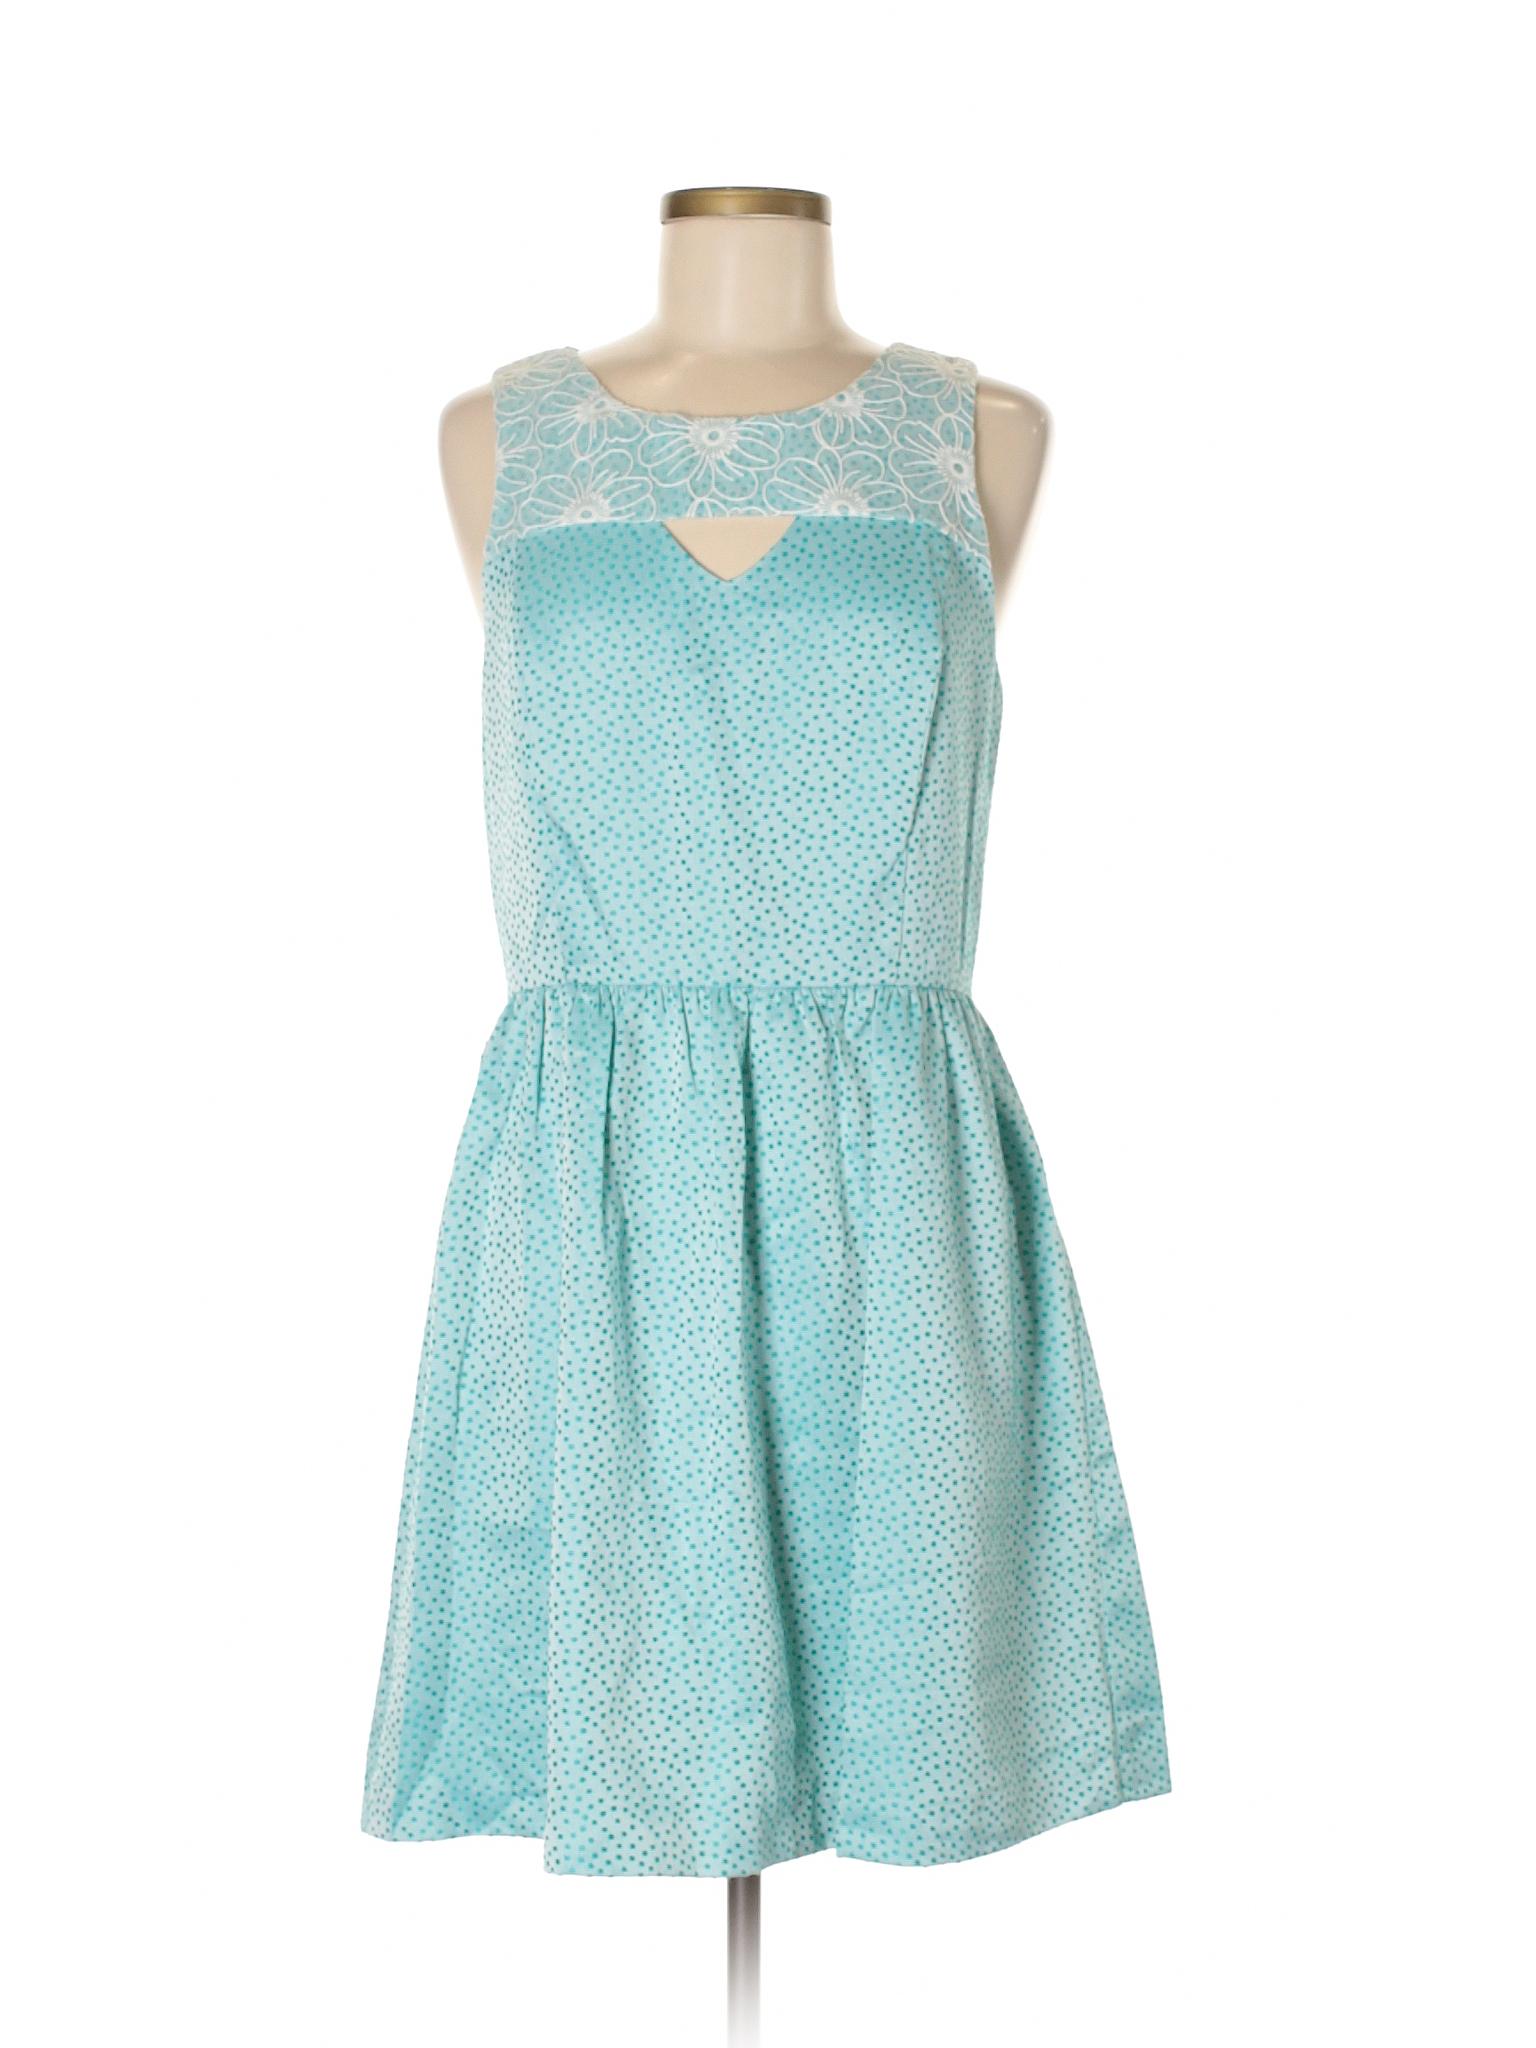 Selling Casual Selling Selling Selling Dress Casual Kensie Dress Kensie Dress Kensie Casual 6q78UU